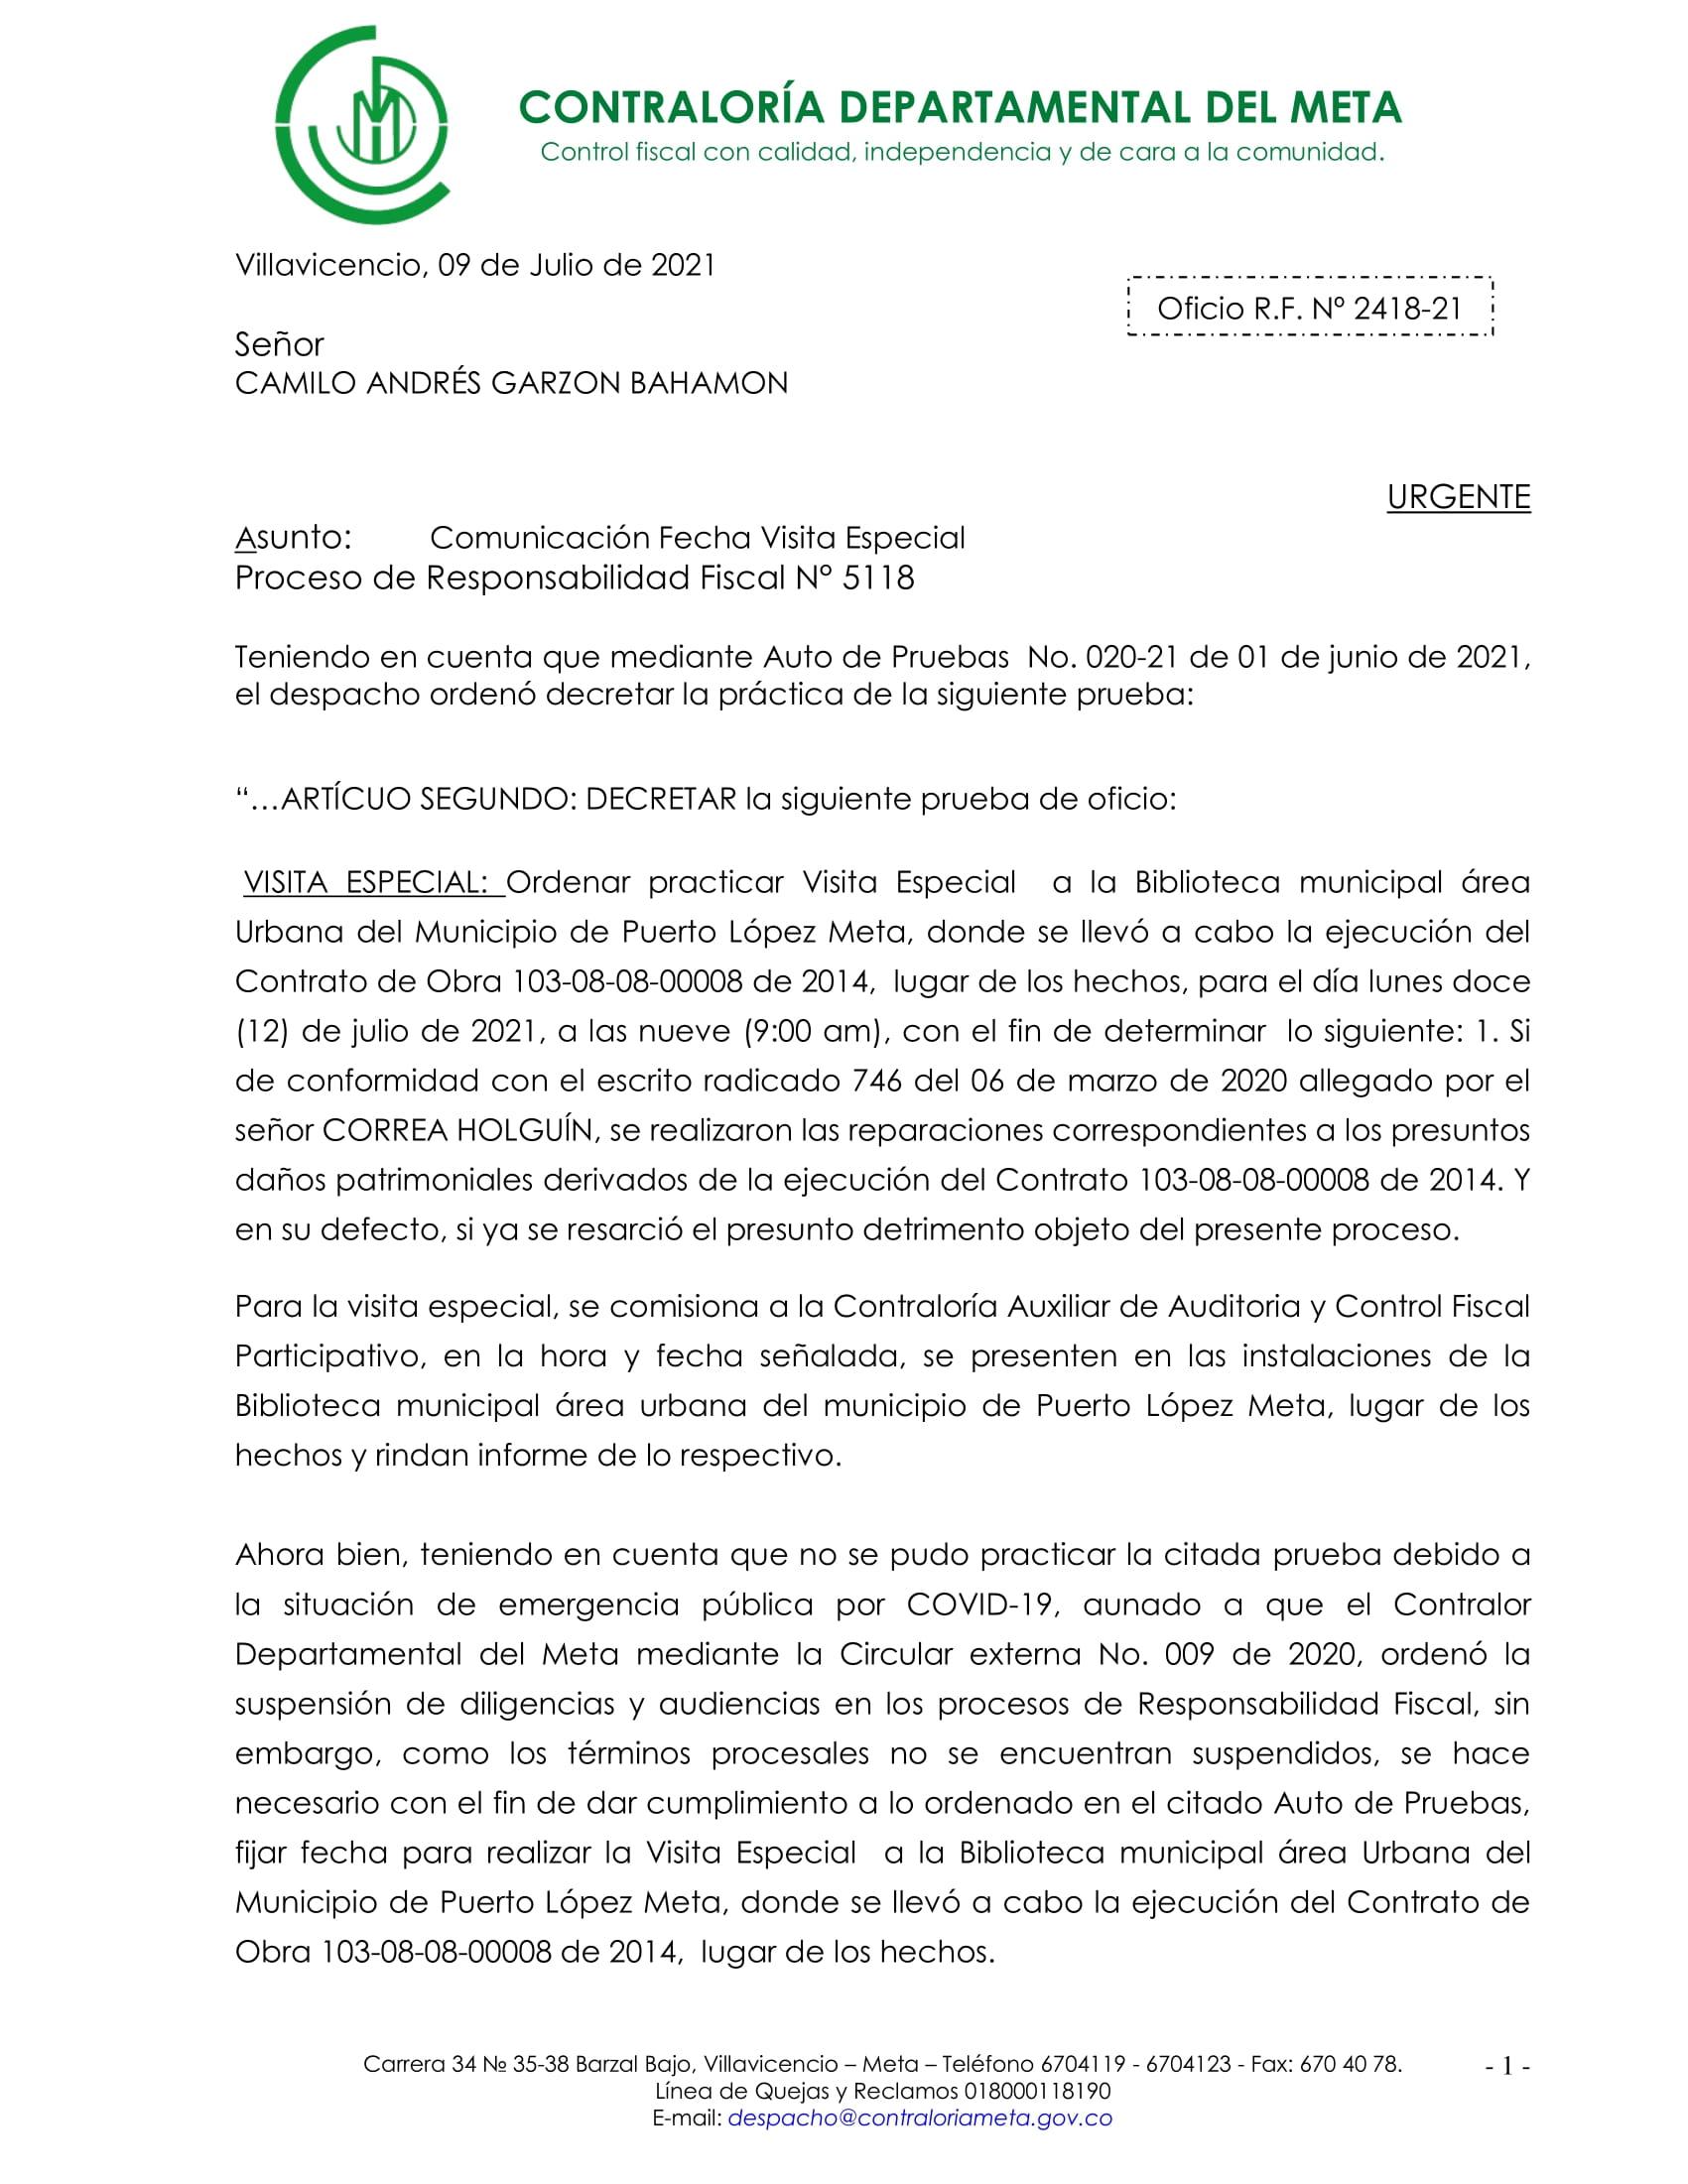 not-elec-camilo-garzon-prf-5118-1